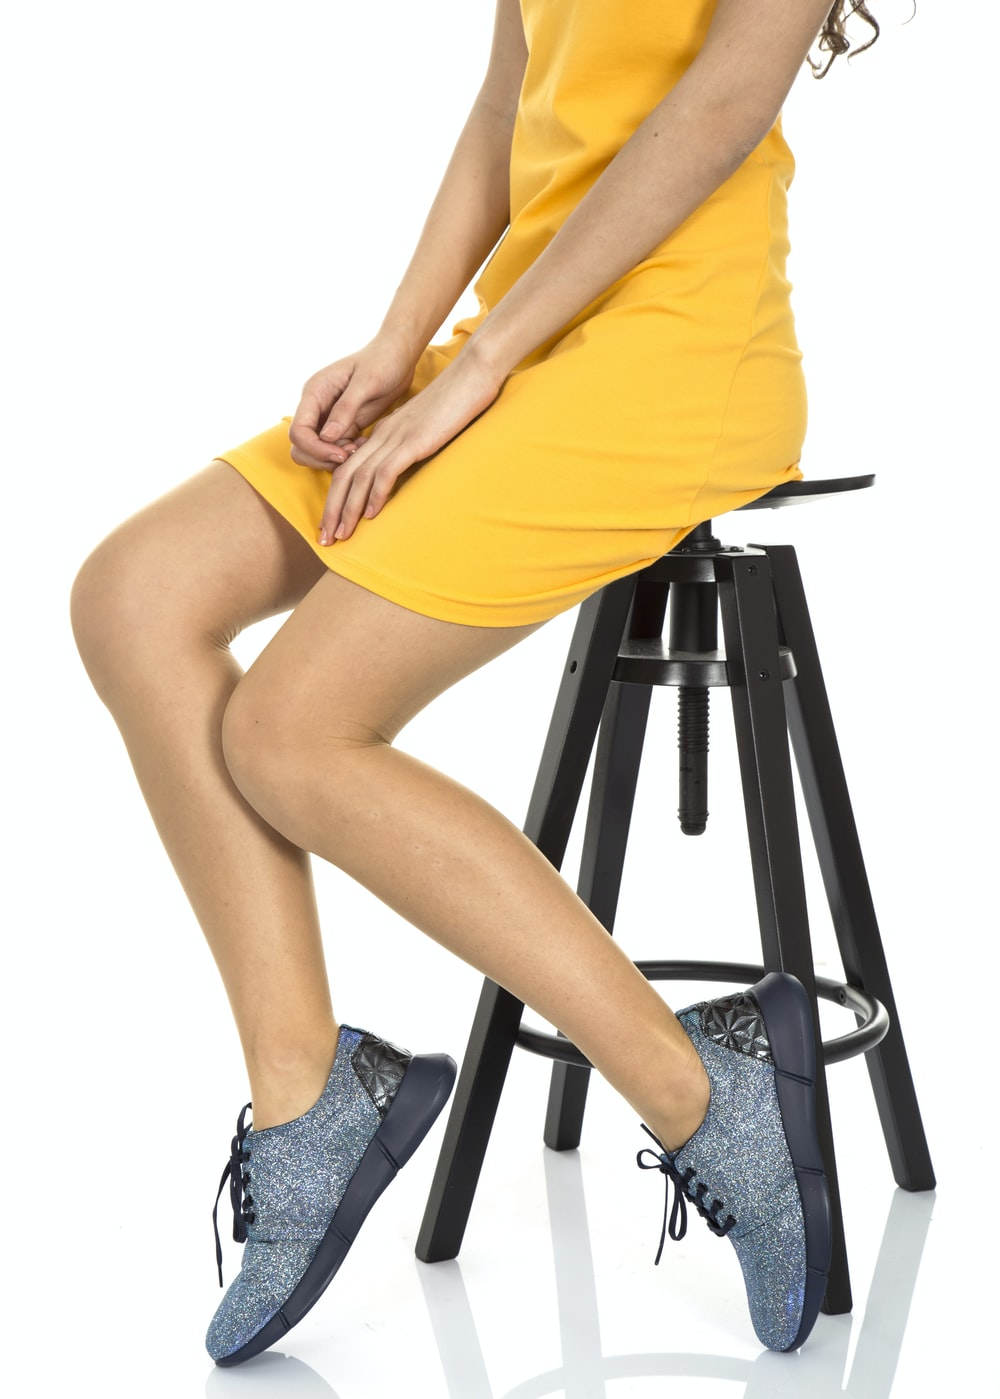 woman in yellow dress sitting on black seat